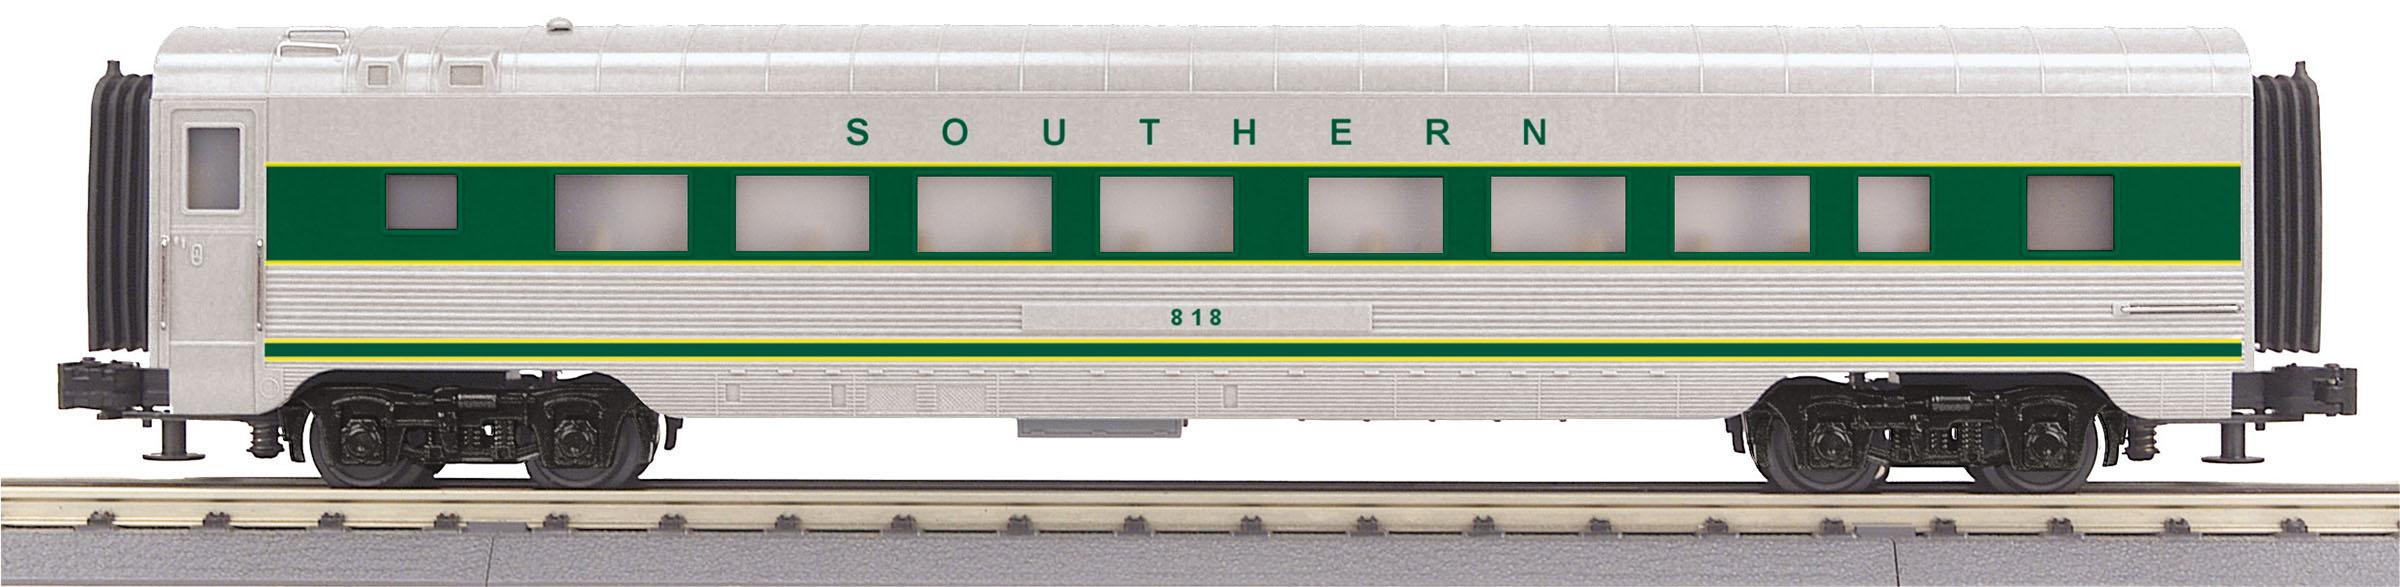 MTH 30-68162 60' Streamlined Coach 3 Rail RailKing Southern Railway